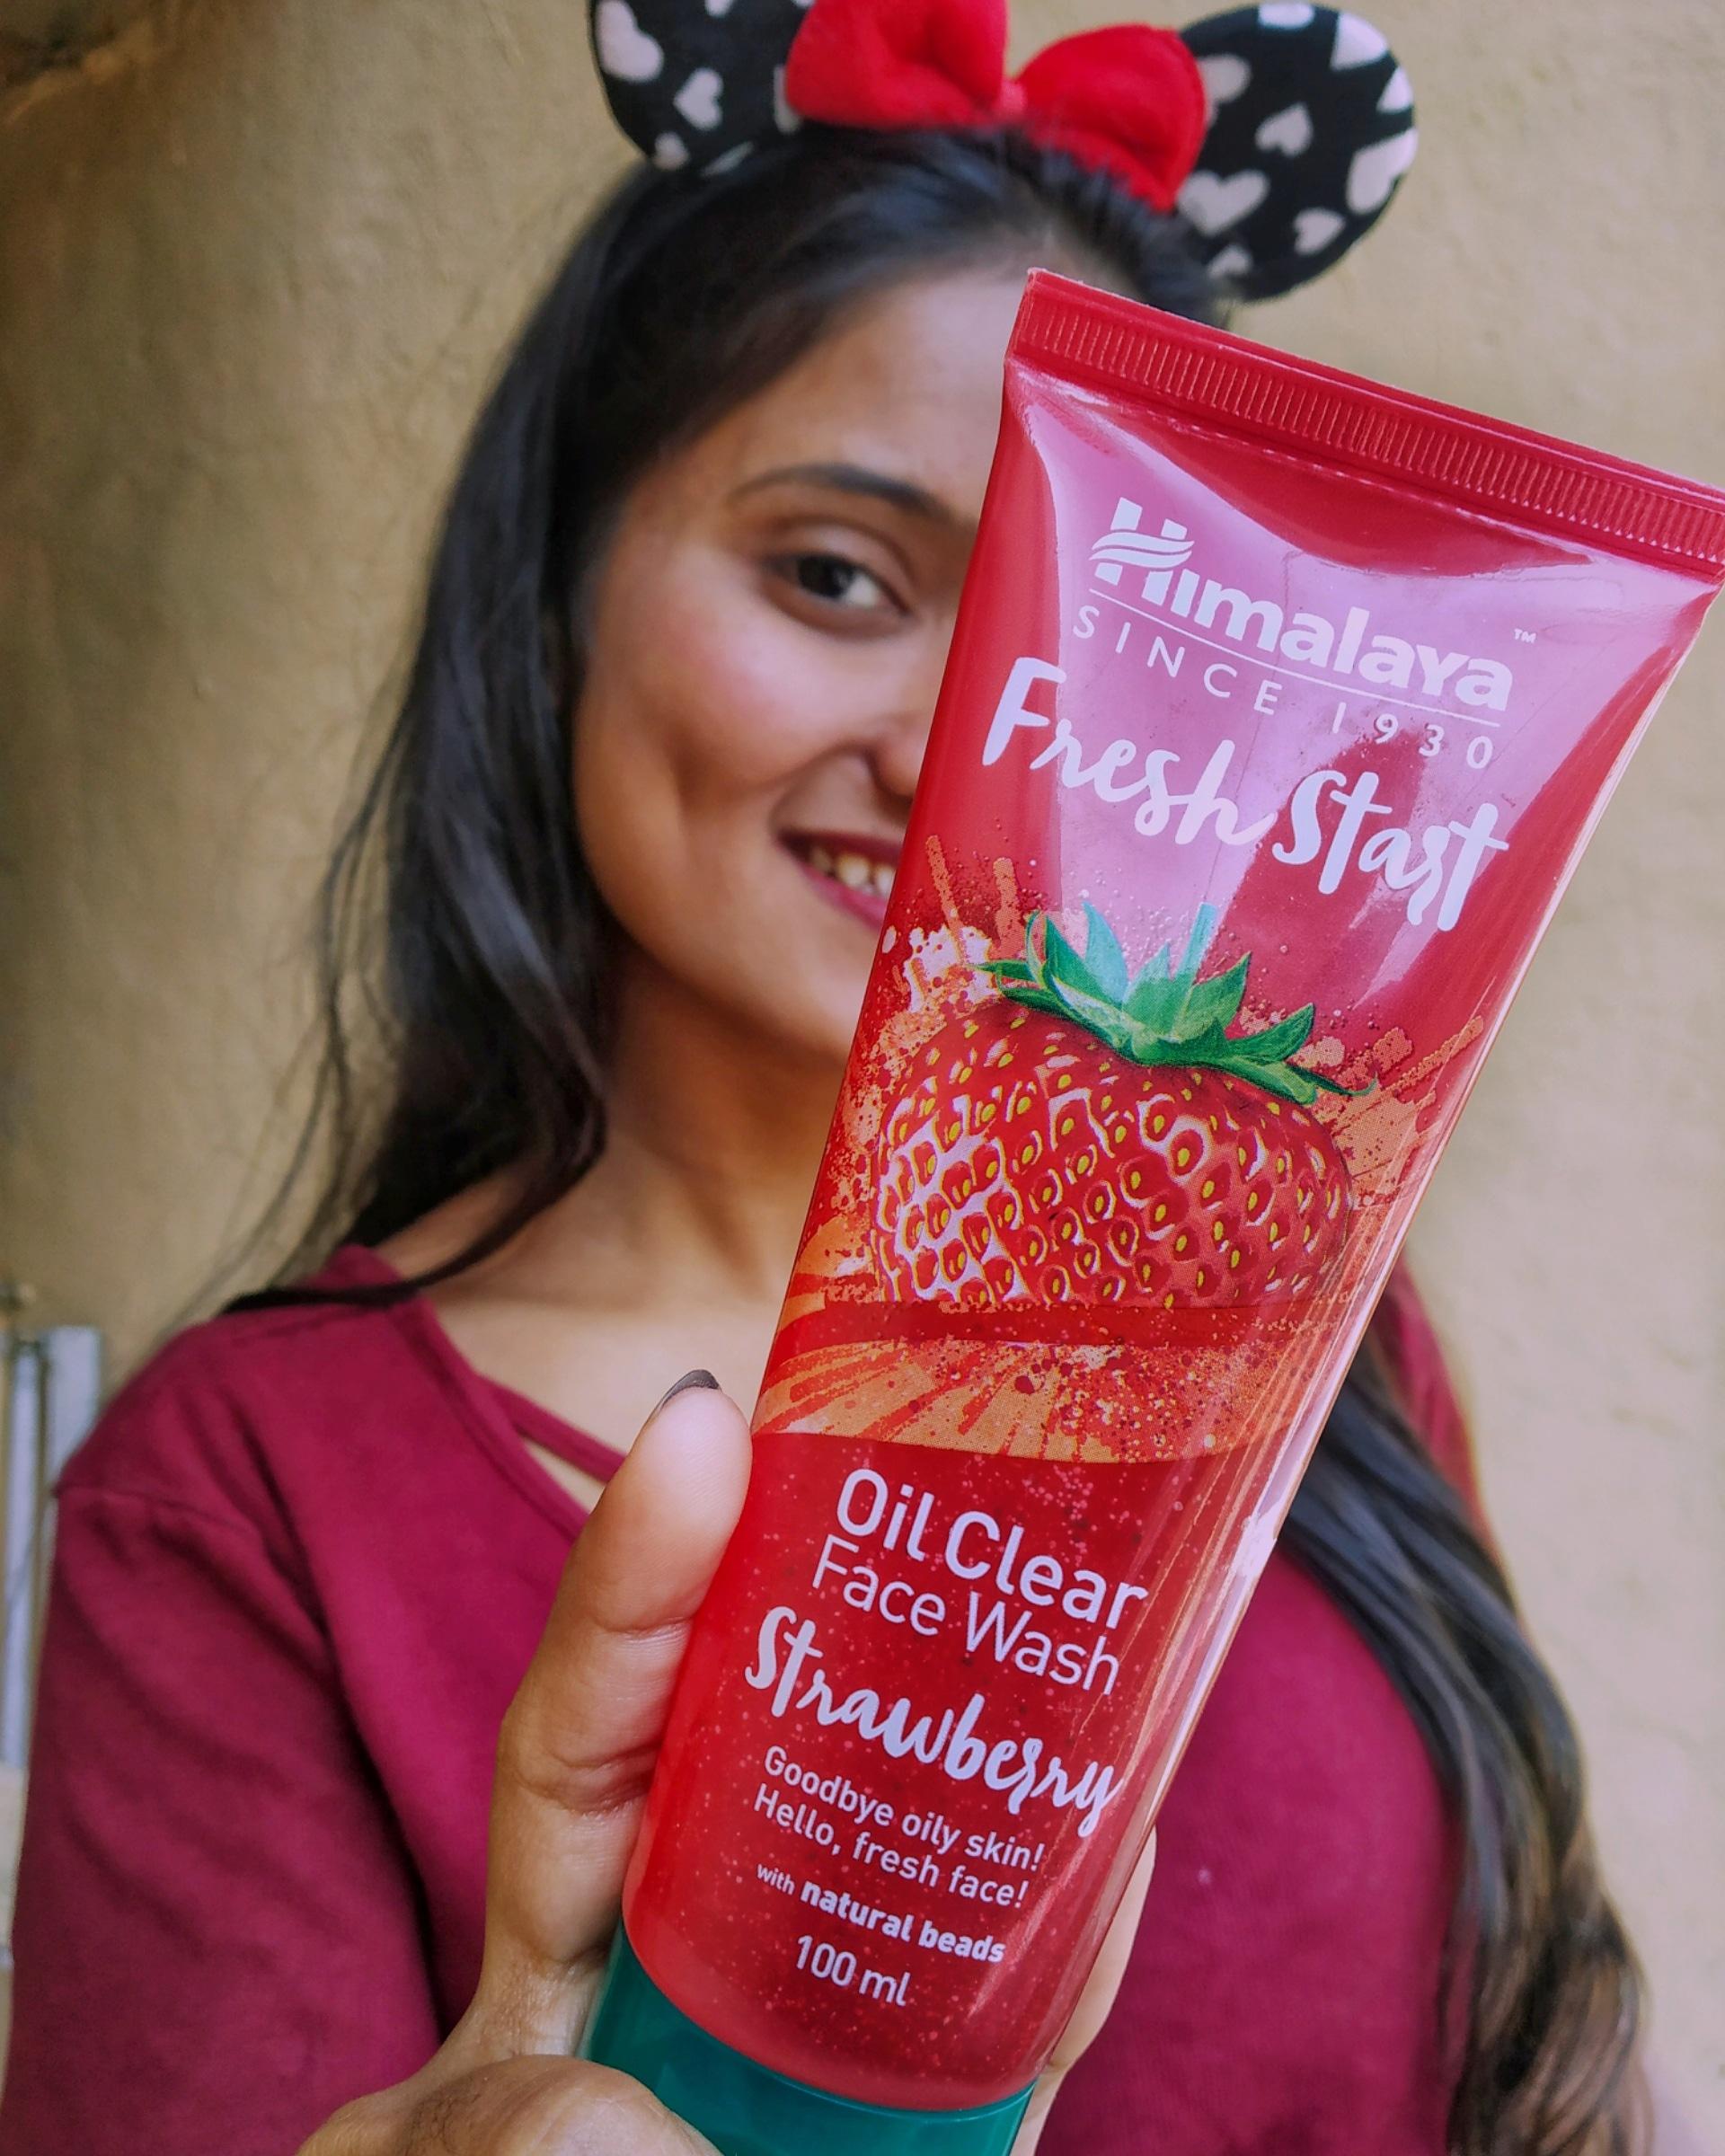 Himalaya Herbals Fresh Start Oil Clear Strawberry Face Wash-Good-By priyankajadhav